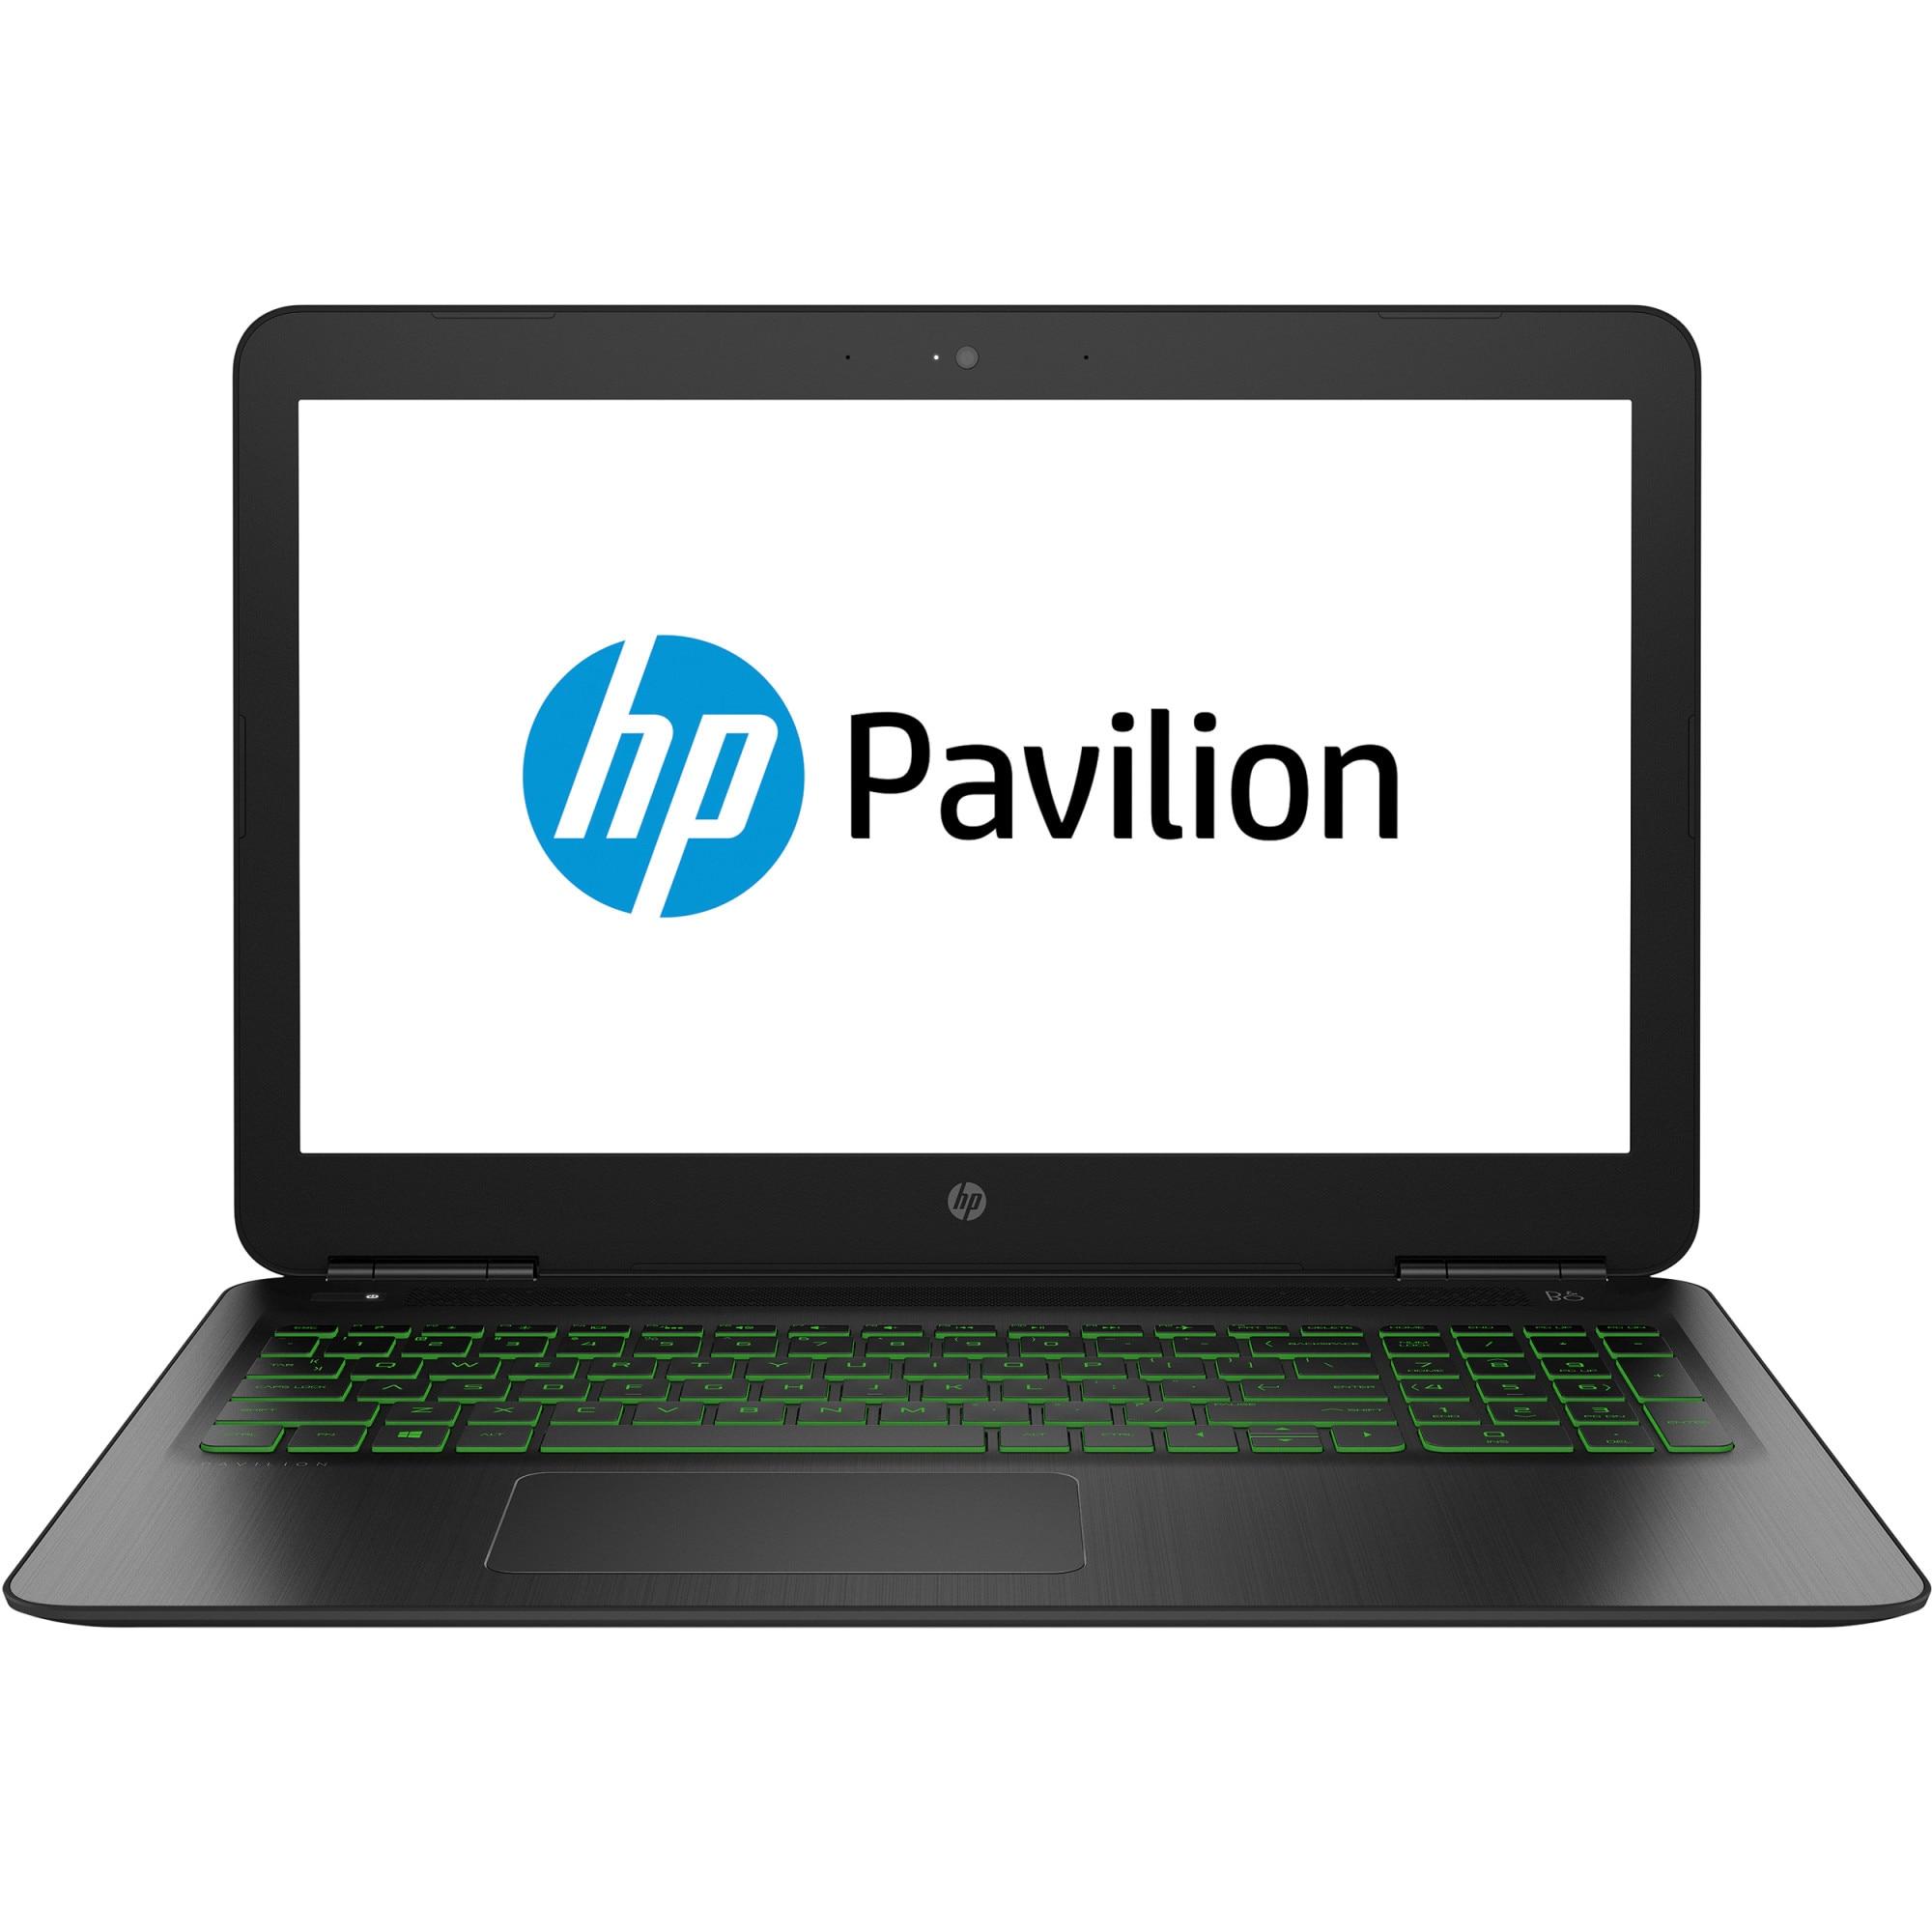 "Fotografie Laptop Gaming HP Pavilion 15-bc408nq cu procesor Intel® Core™ i7-8750H pana la 4.10 GHz, Coffee Lake, 15.6"", Full HD, 8GB, 1TB, NVIDIA GeForce GTX 1050 4GB, Free DOS, Shadow Black"